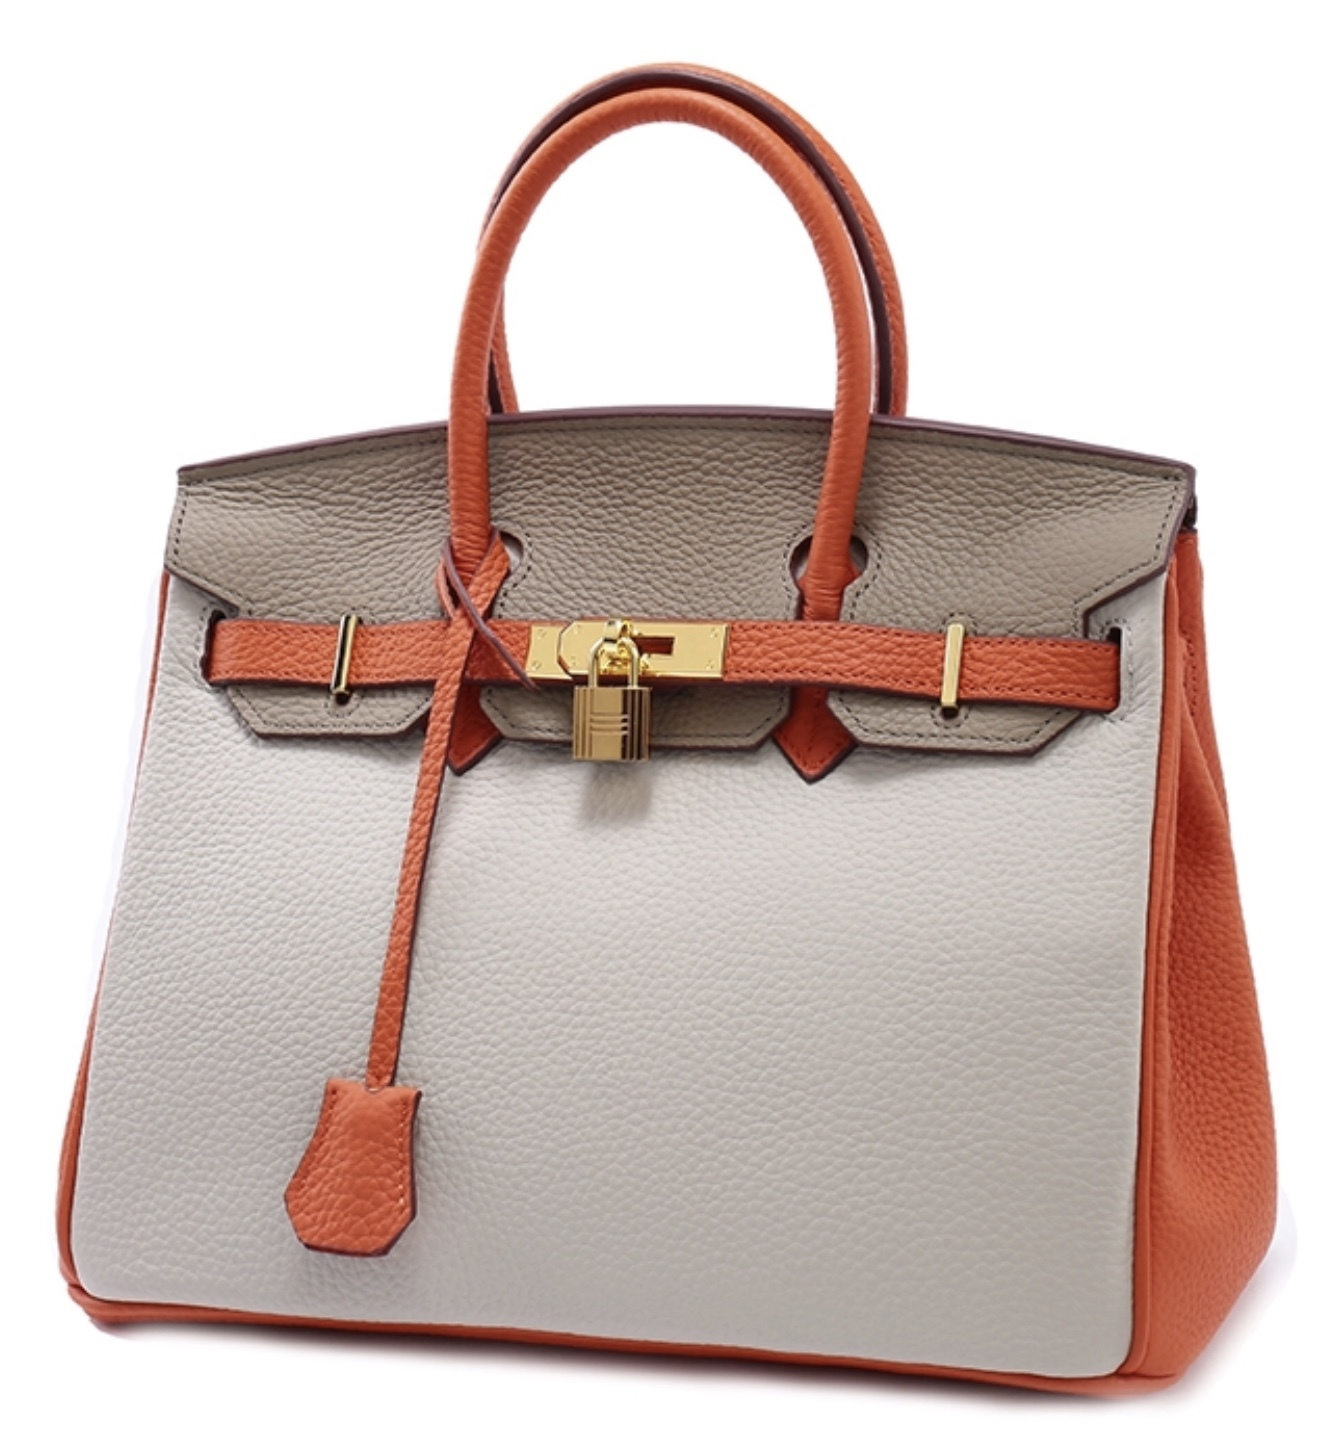 35cm Color Block Pebbled Italian Leather Birkin Style Satchel Handbag Purse 1998